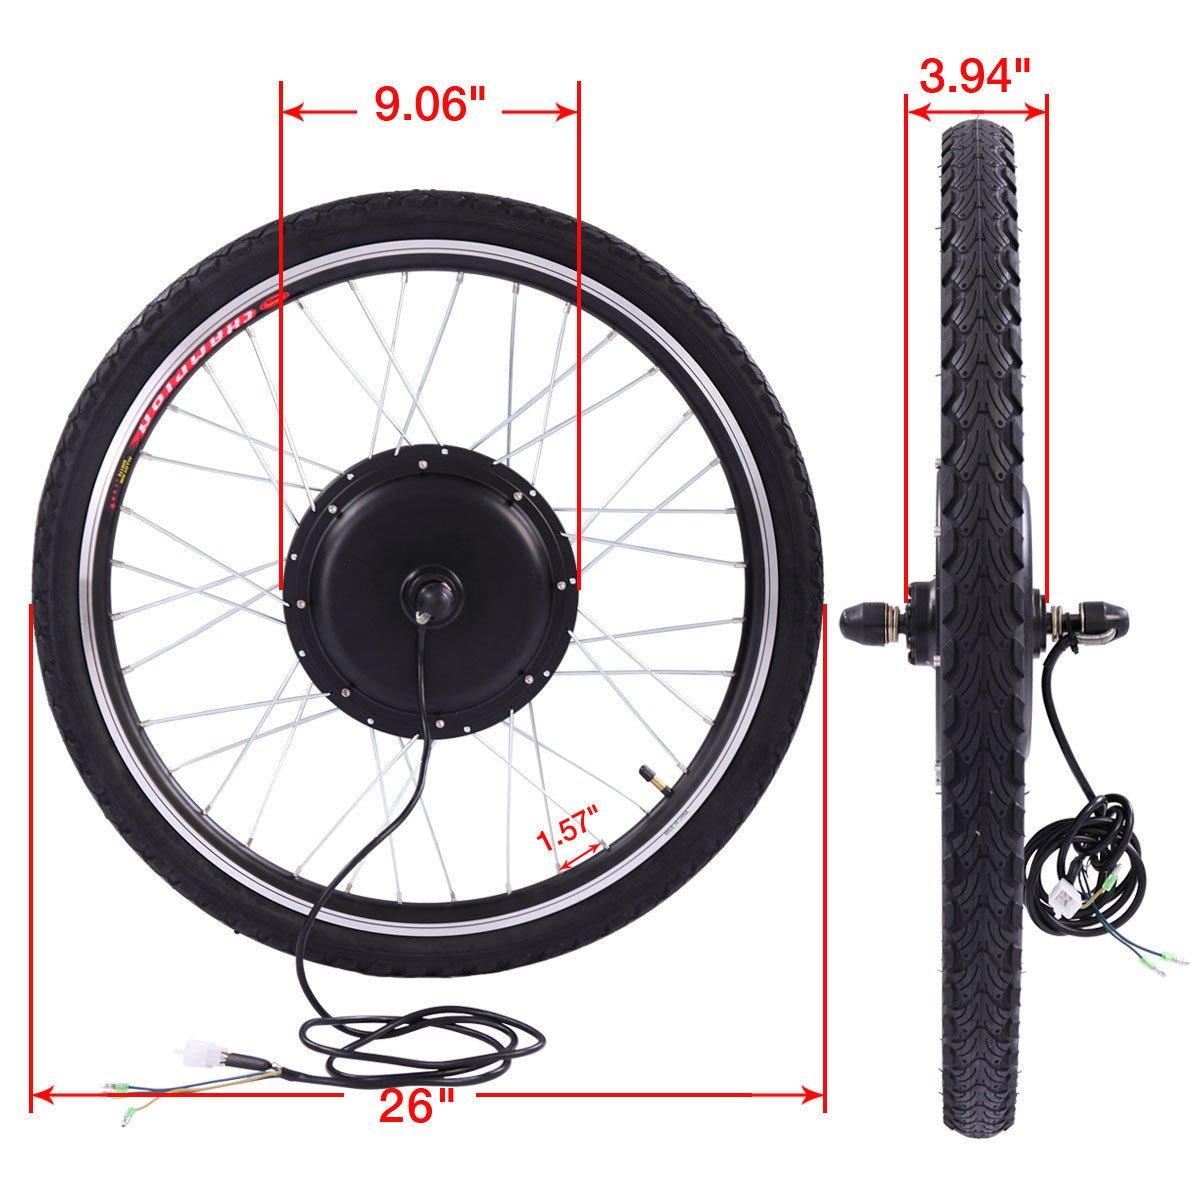 JAXPETY 36V 500W Electric Bicycle Cycle 26'' E Bike Front Wheel Ebike Hub Motor Conversion Kit Hub Motor Wheel by JAXPETY (Image #2)